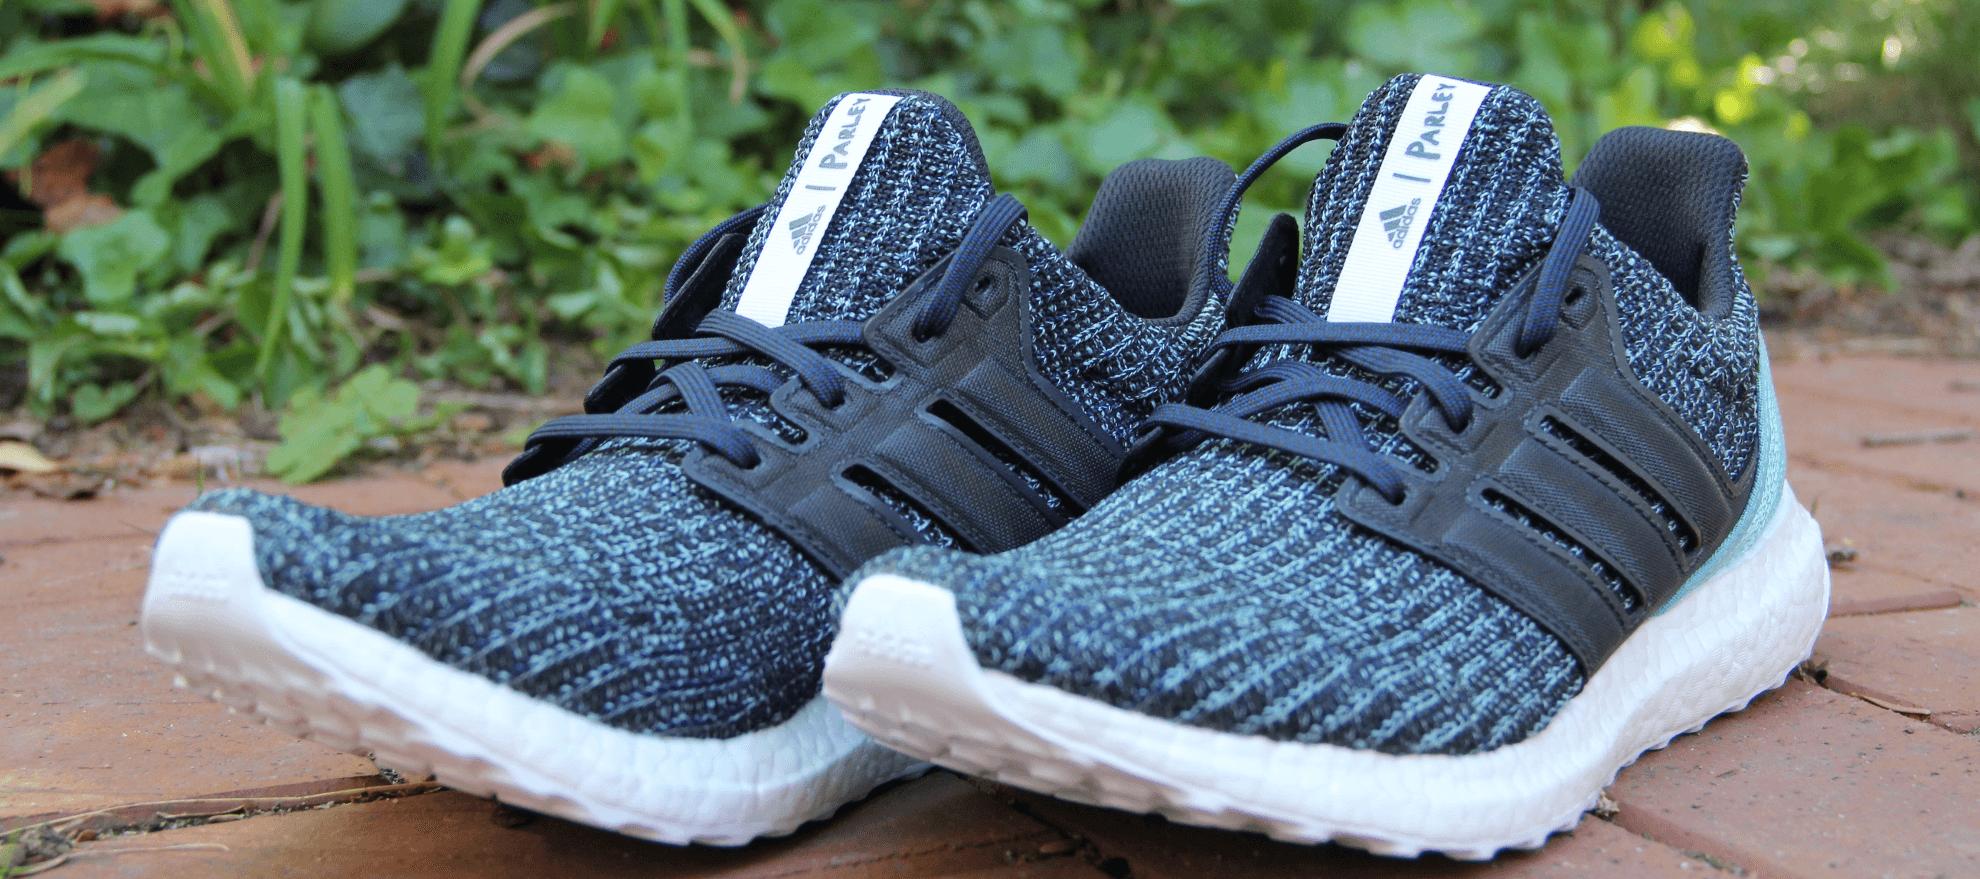 Schuhe Ultraboost Halbsmarten Die Adidas Parley yb76fg